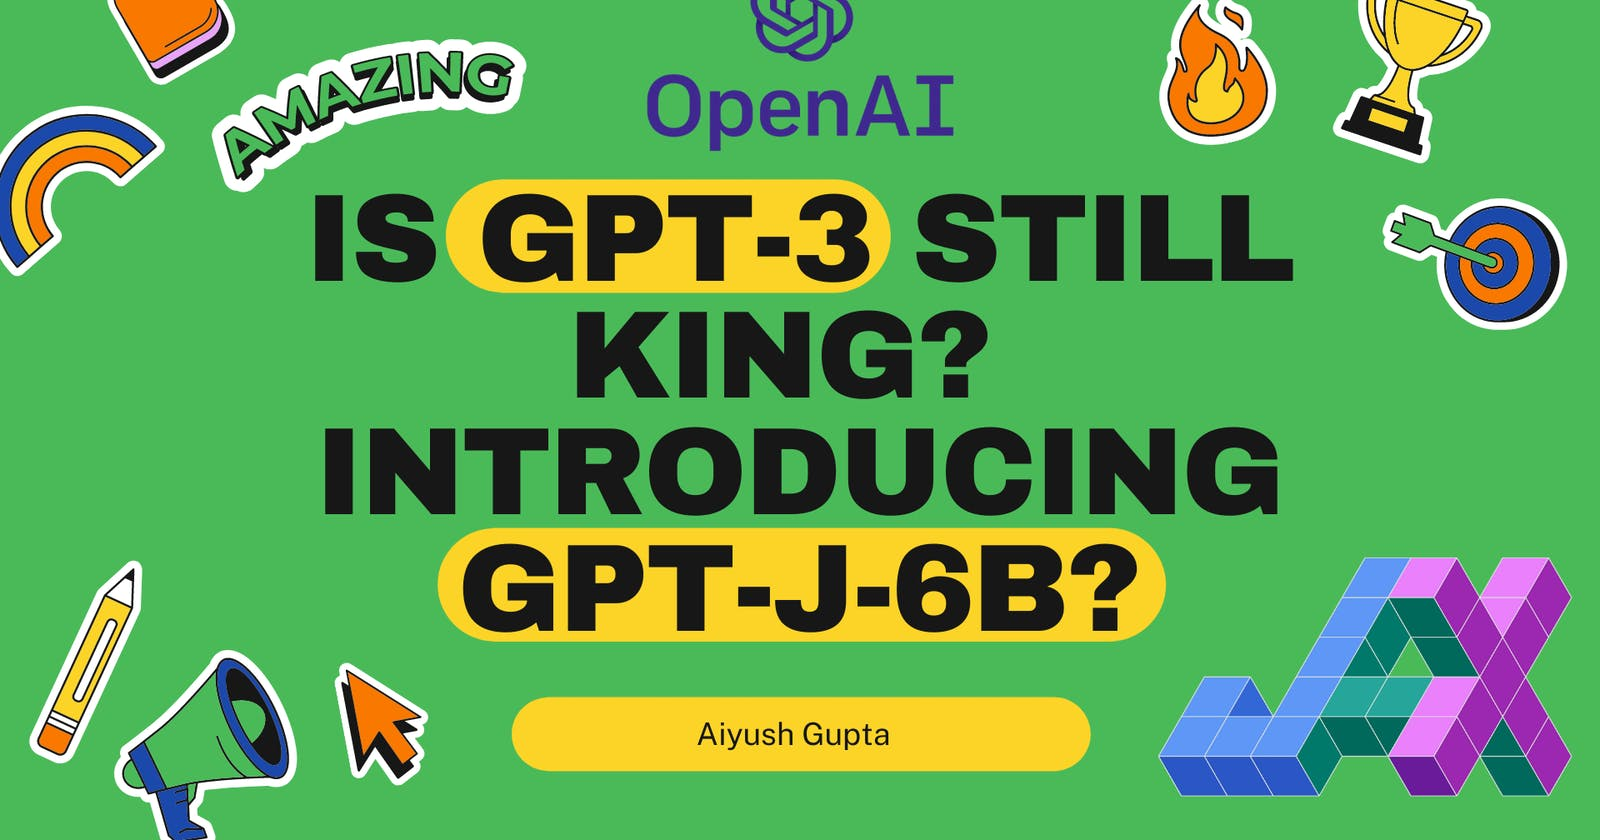 Is GPT-3 still King? Introducing GPT-J-6B